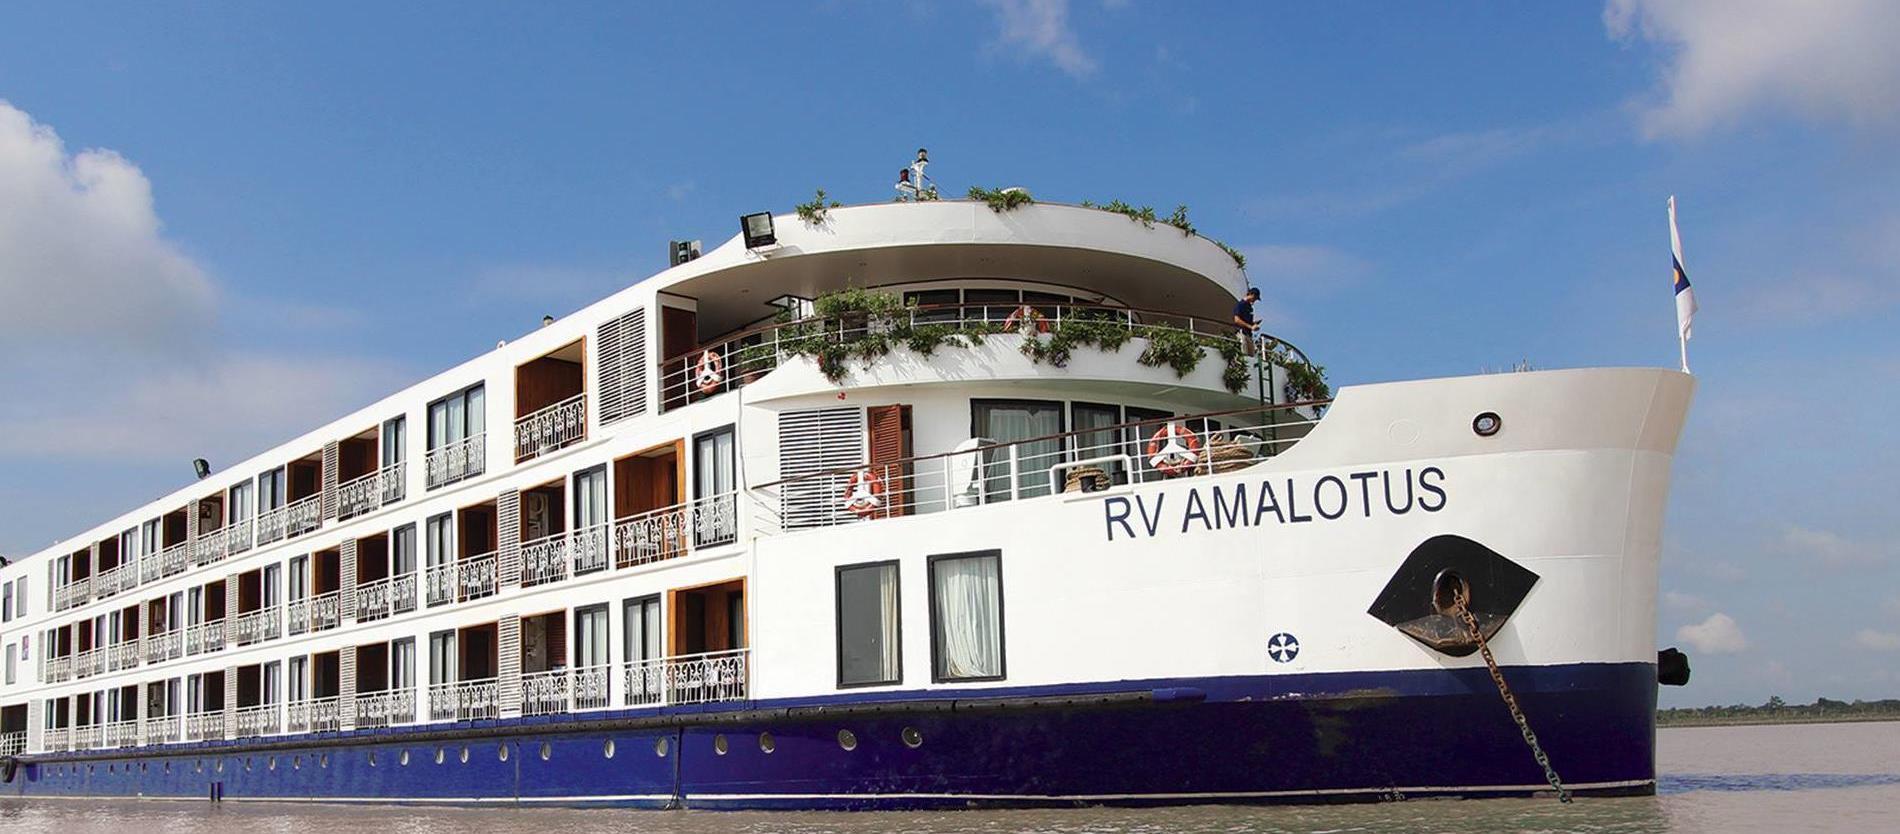 RV AmaLotus